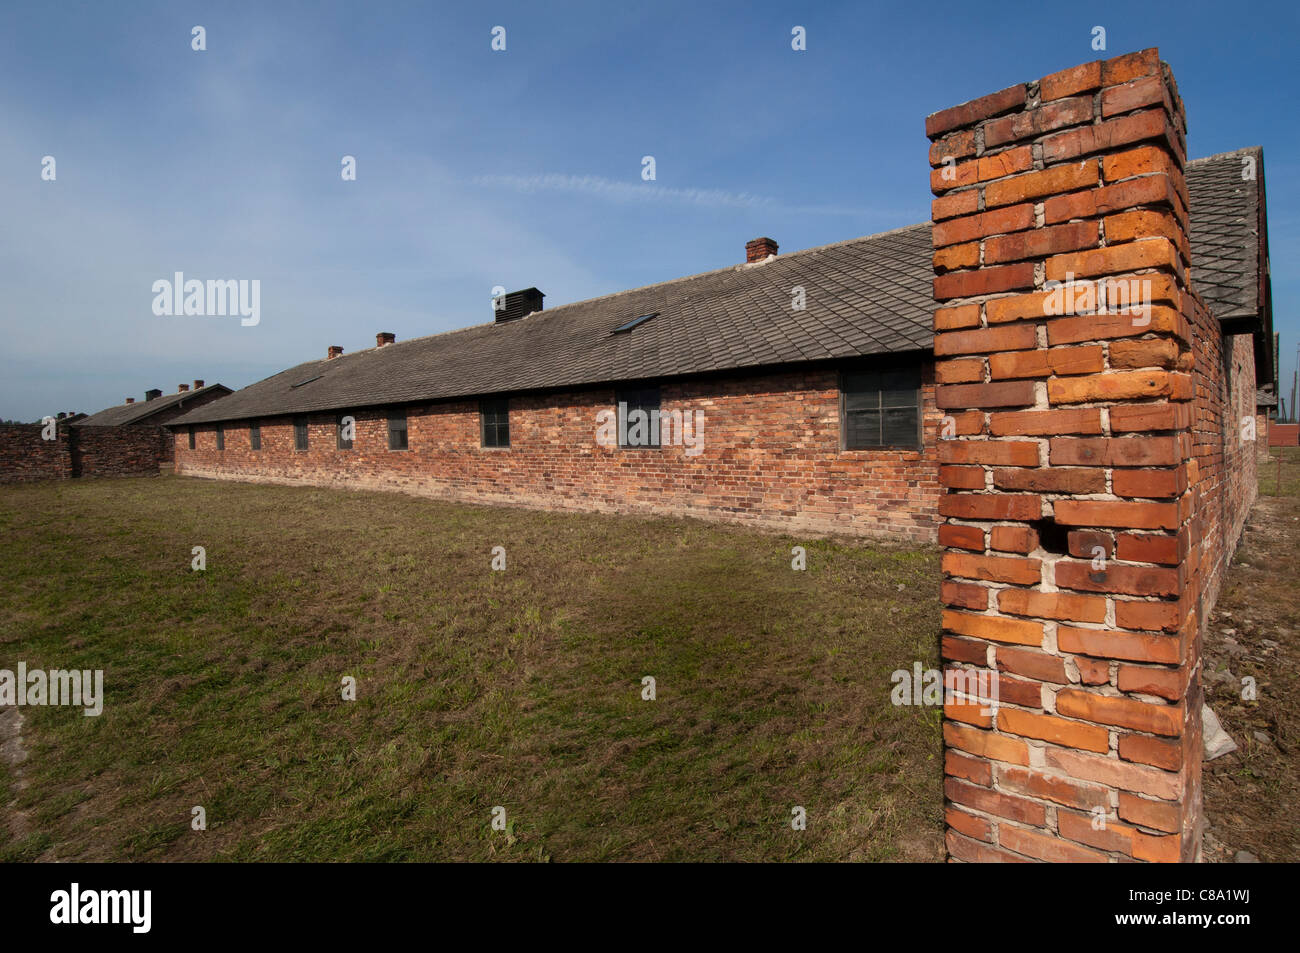 Auschwitz II - Birkenau concentration and extermination camp, Oswiceim, Poland. External shot of inmates' barracks - Stock Image